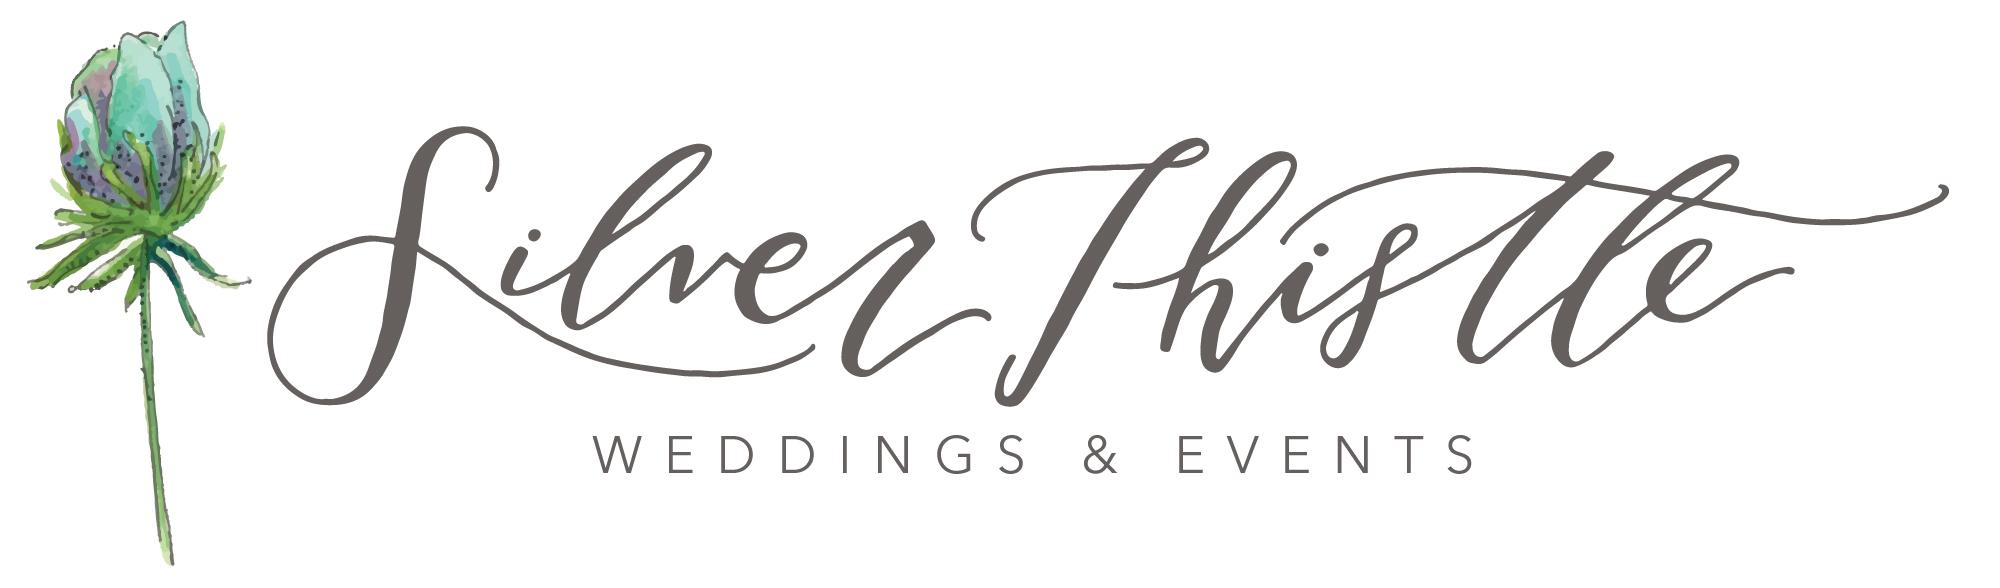 Silver Thistle Weddings Wedding Planner